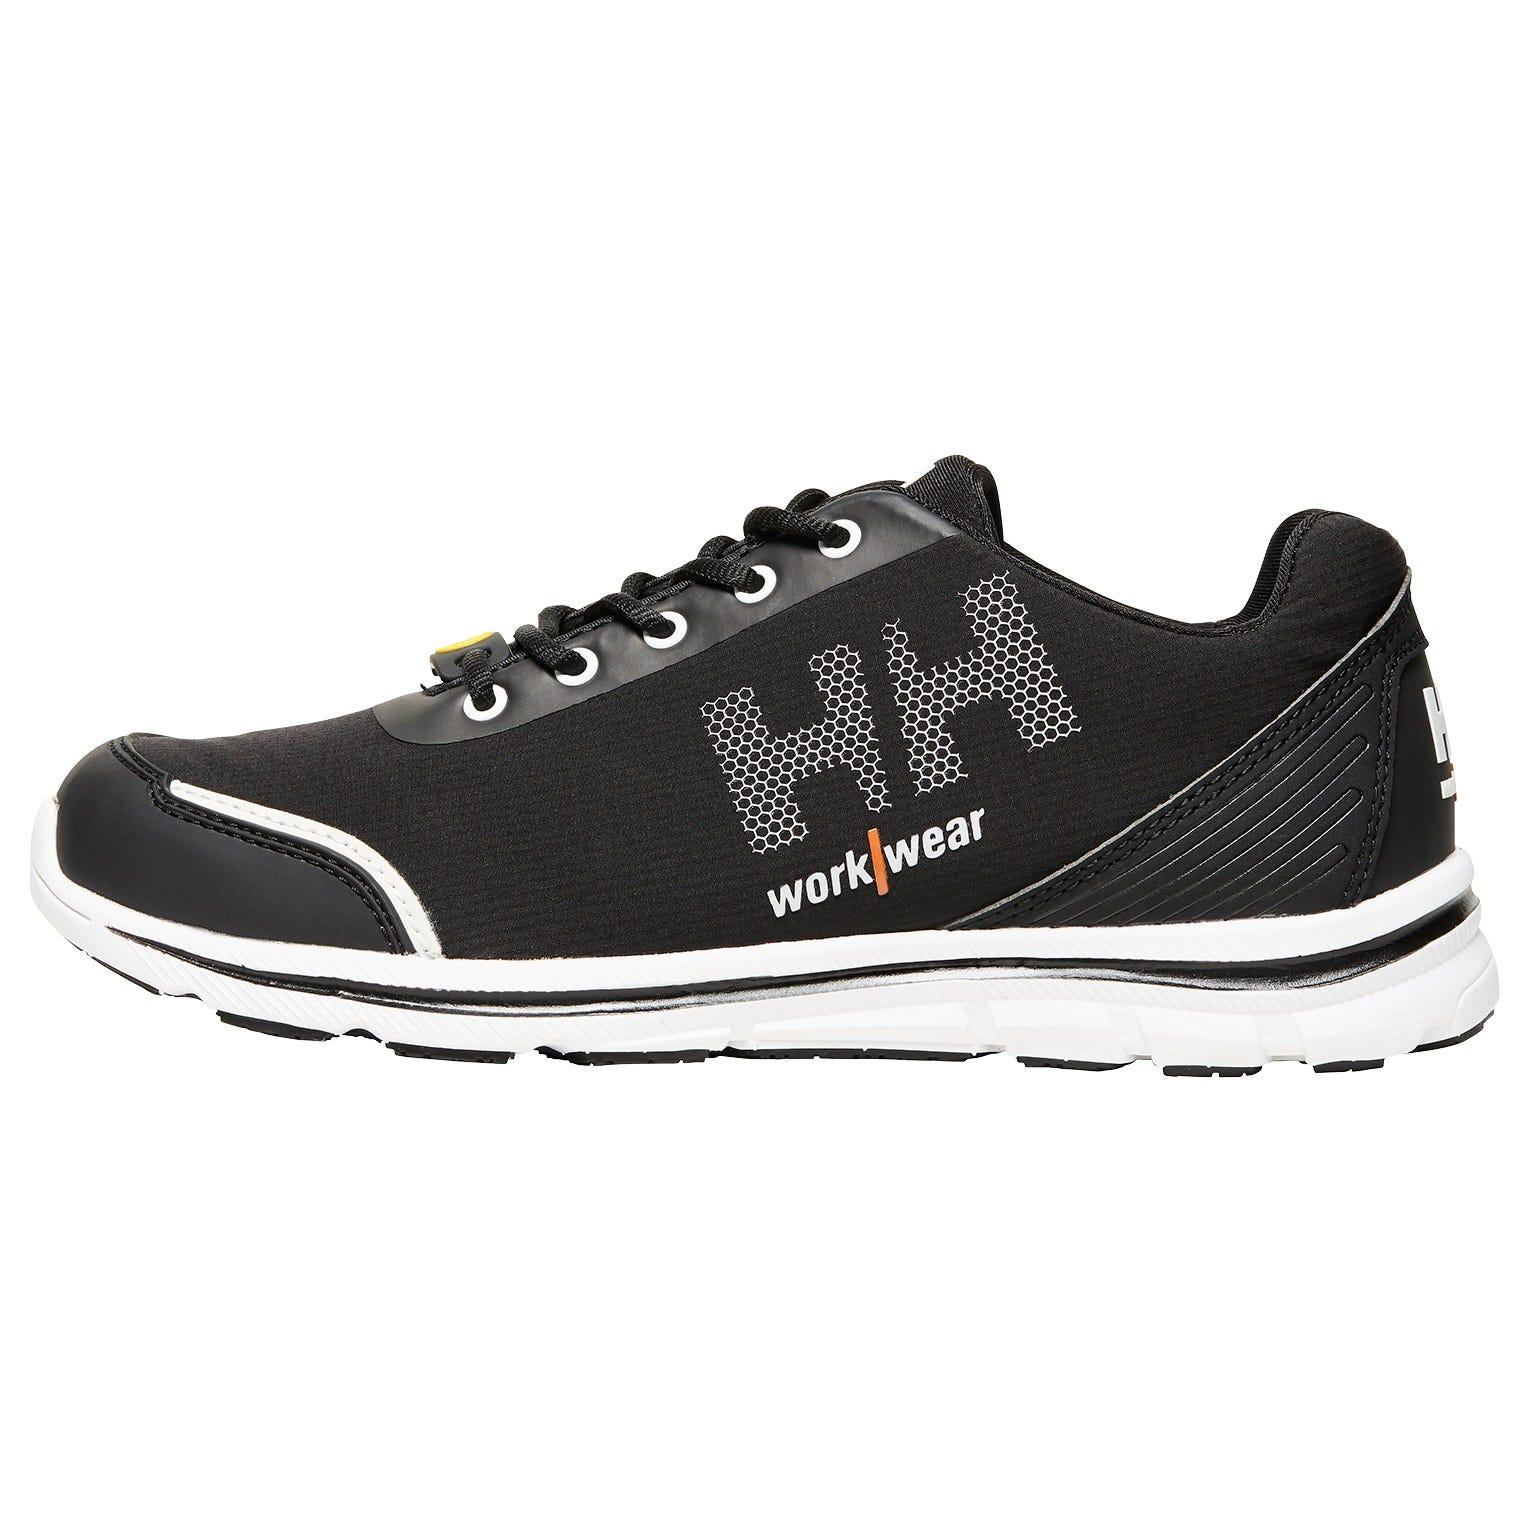 HH Workwear Workwear Helly Hansen Scarpa Antinfortunistica Oslo St Certificata O1 Antiscivolo 36 Nero